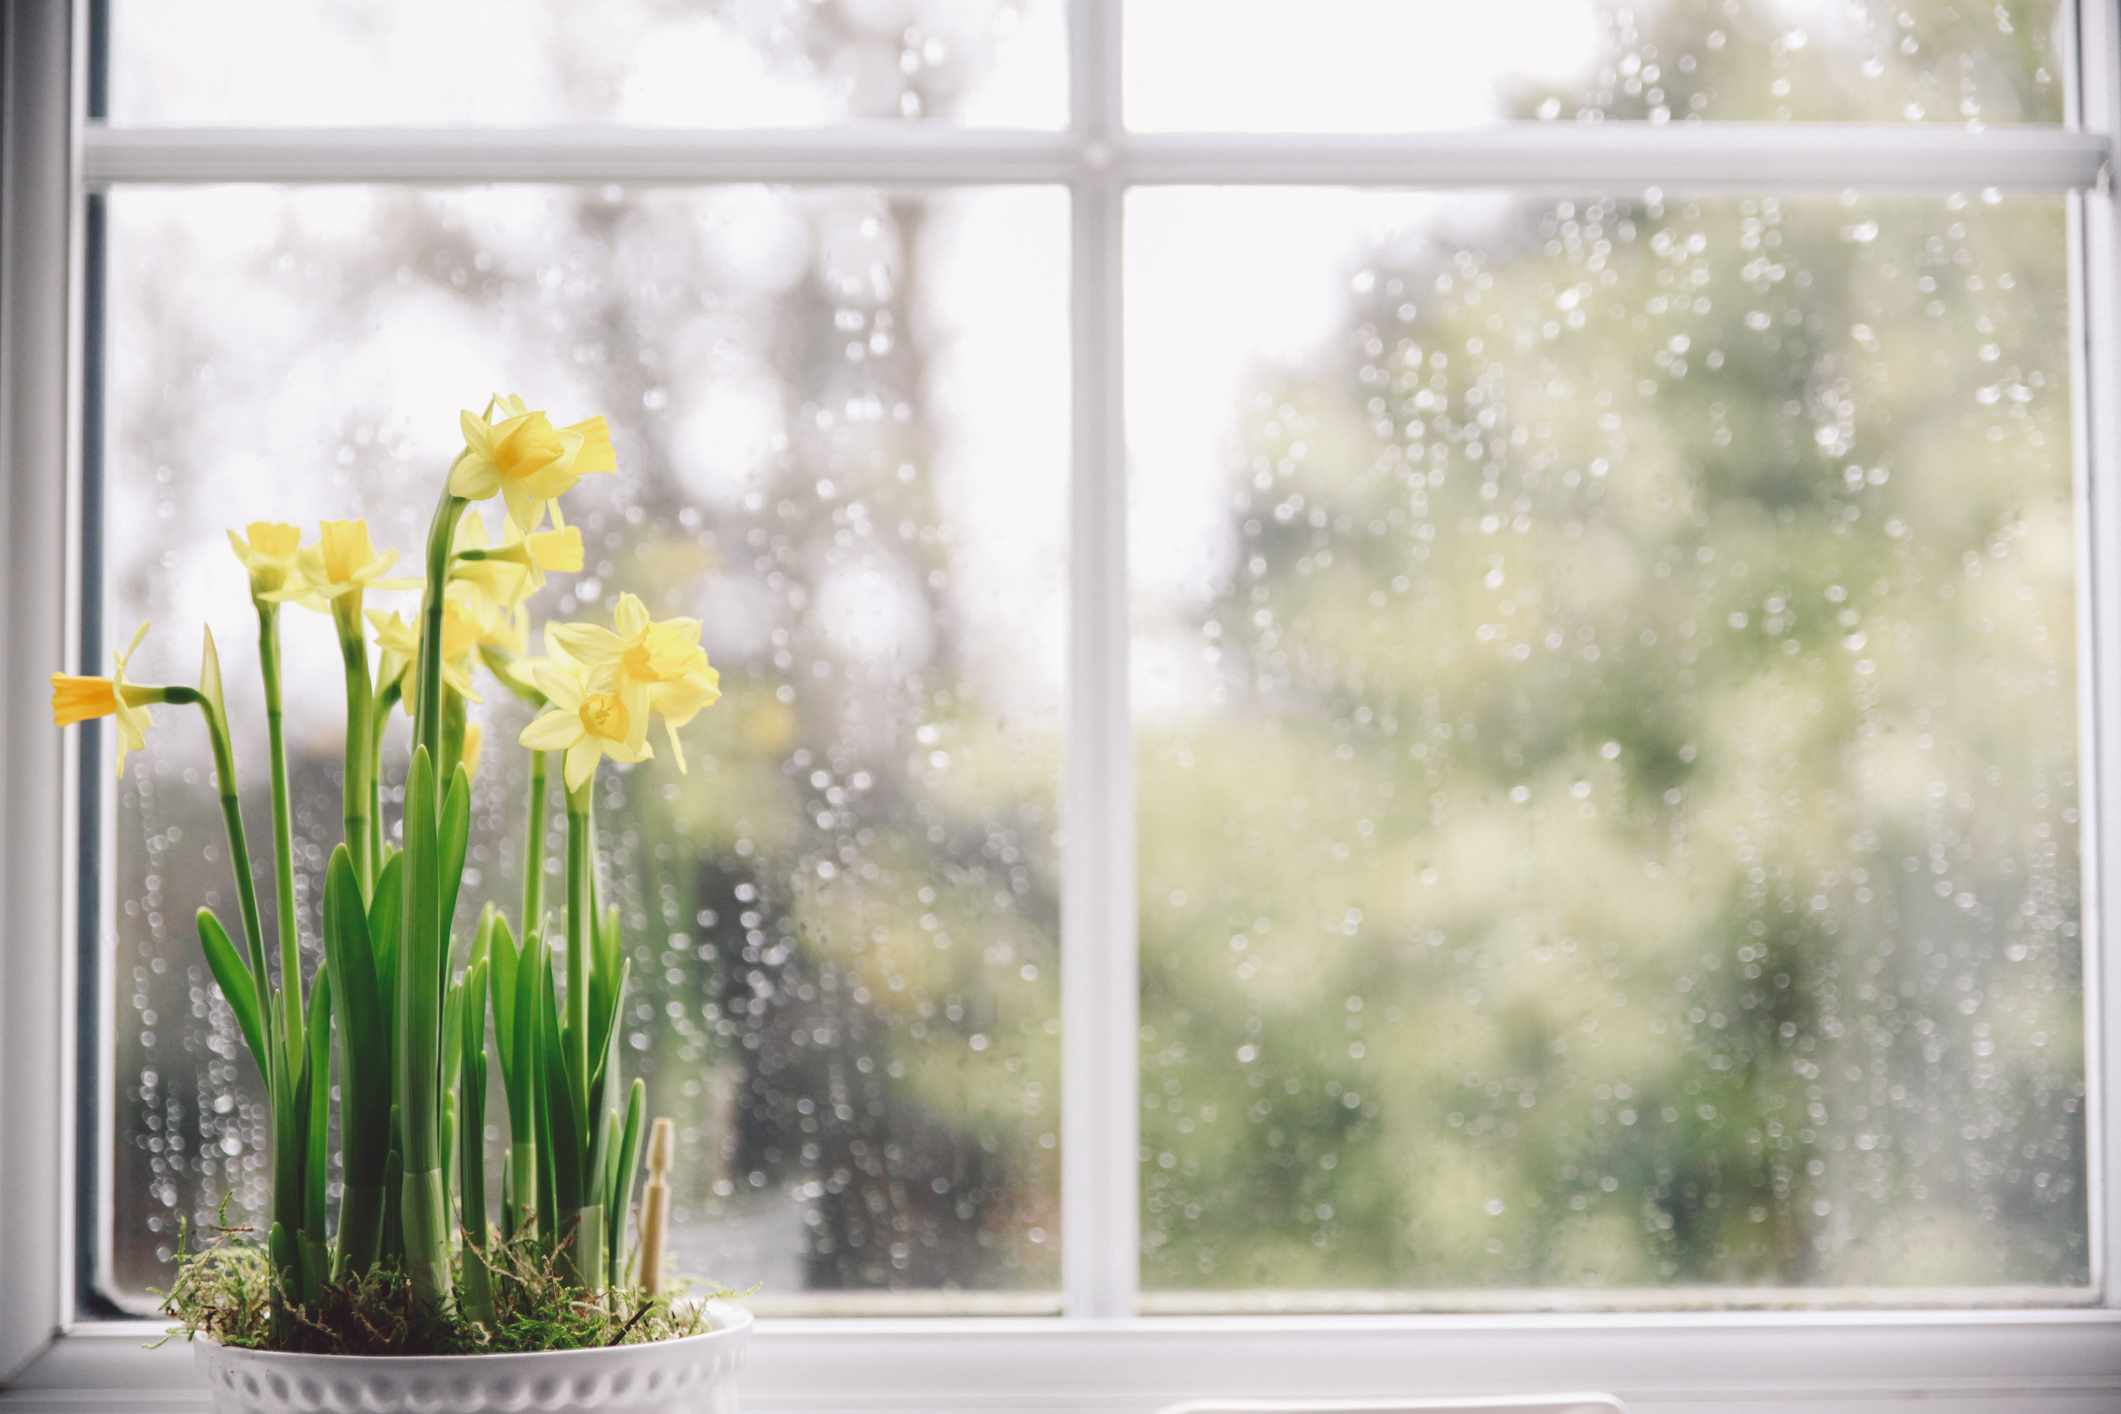 Potted yellow daffodils on a windowsill